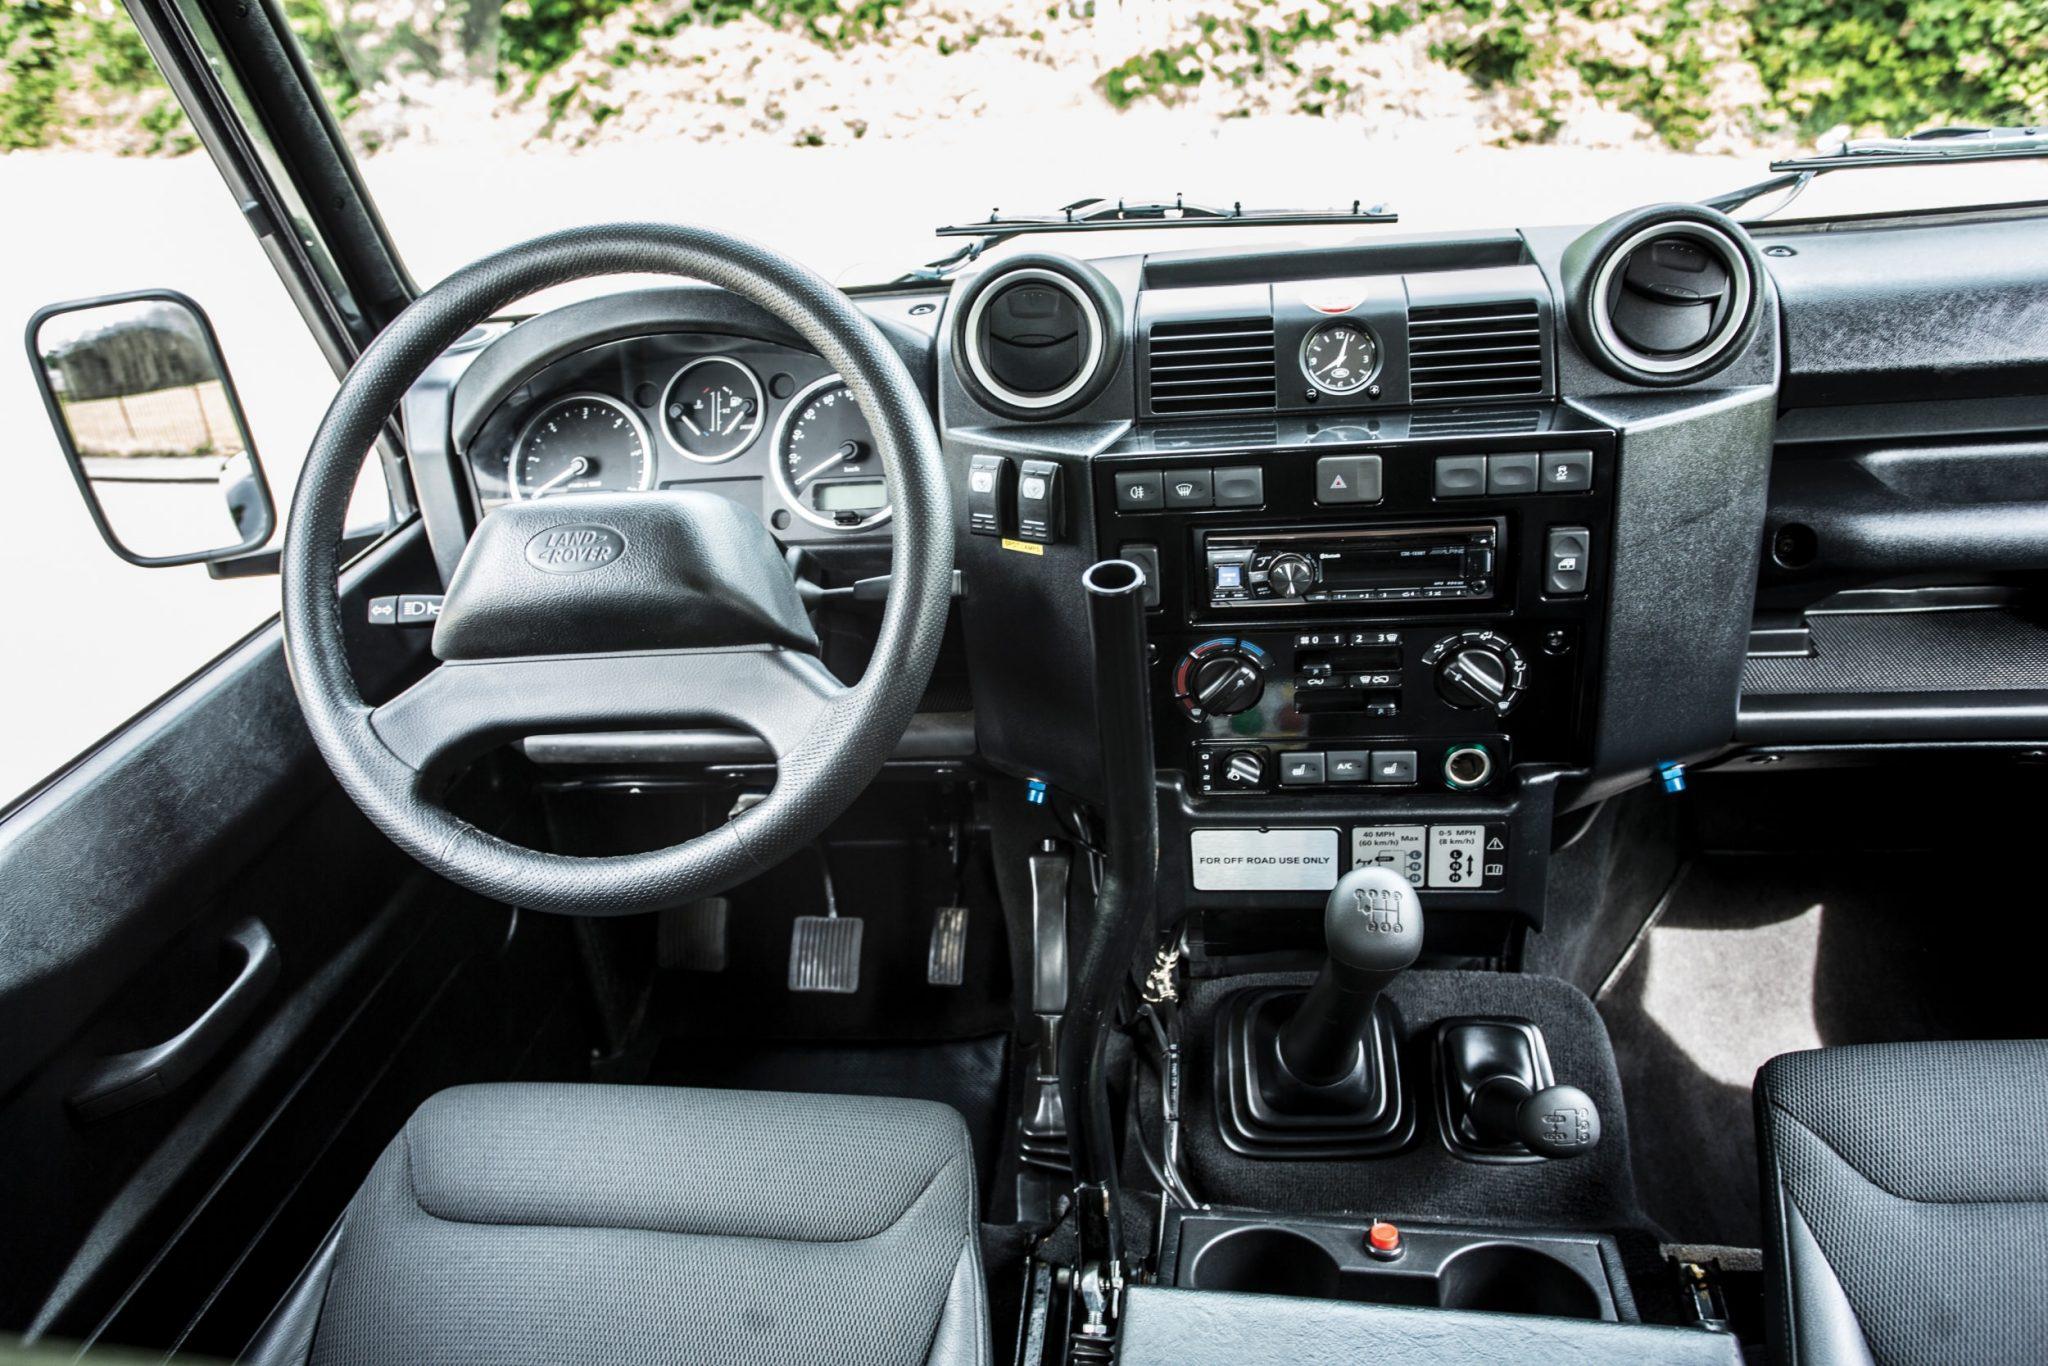 James Bond Spectre Land Rover Defender Svx 3 1480x987 - Ex-James Bond  Spectre